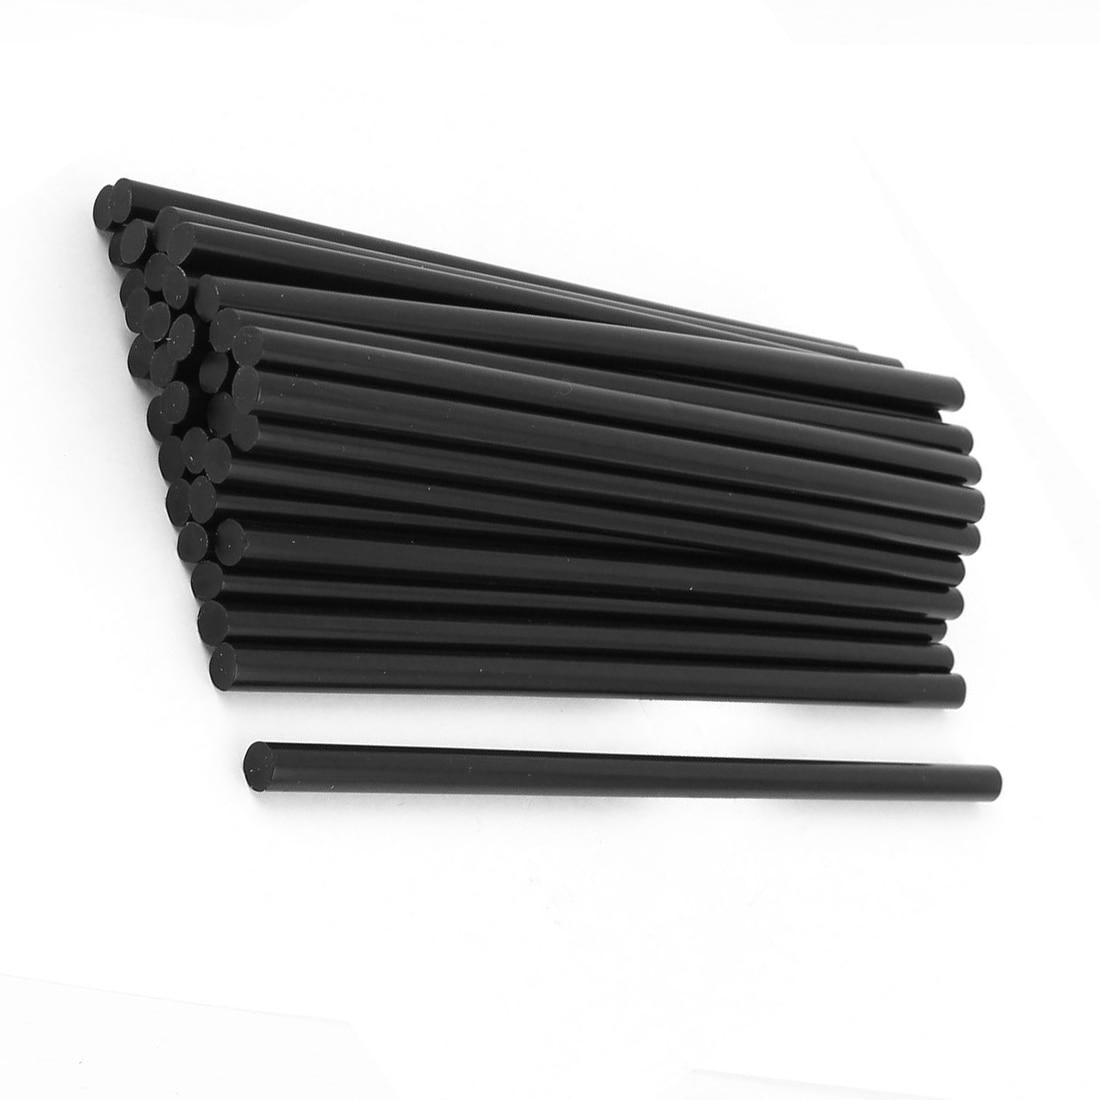 5PACK 35 Pcs 7mm Diameter 190mm Length Plastic Black Hot Melt Glue Stick 27cm hot melt glue stick translucent white 5 pcs